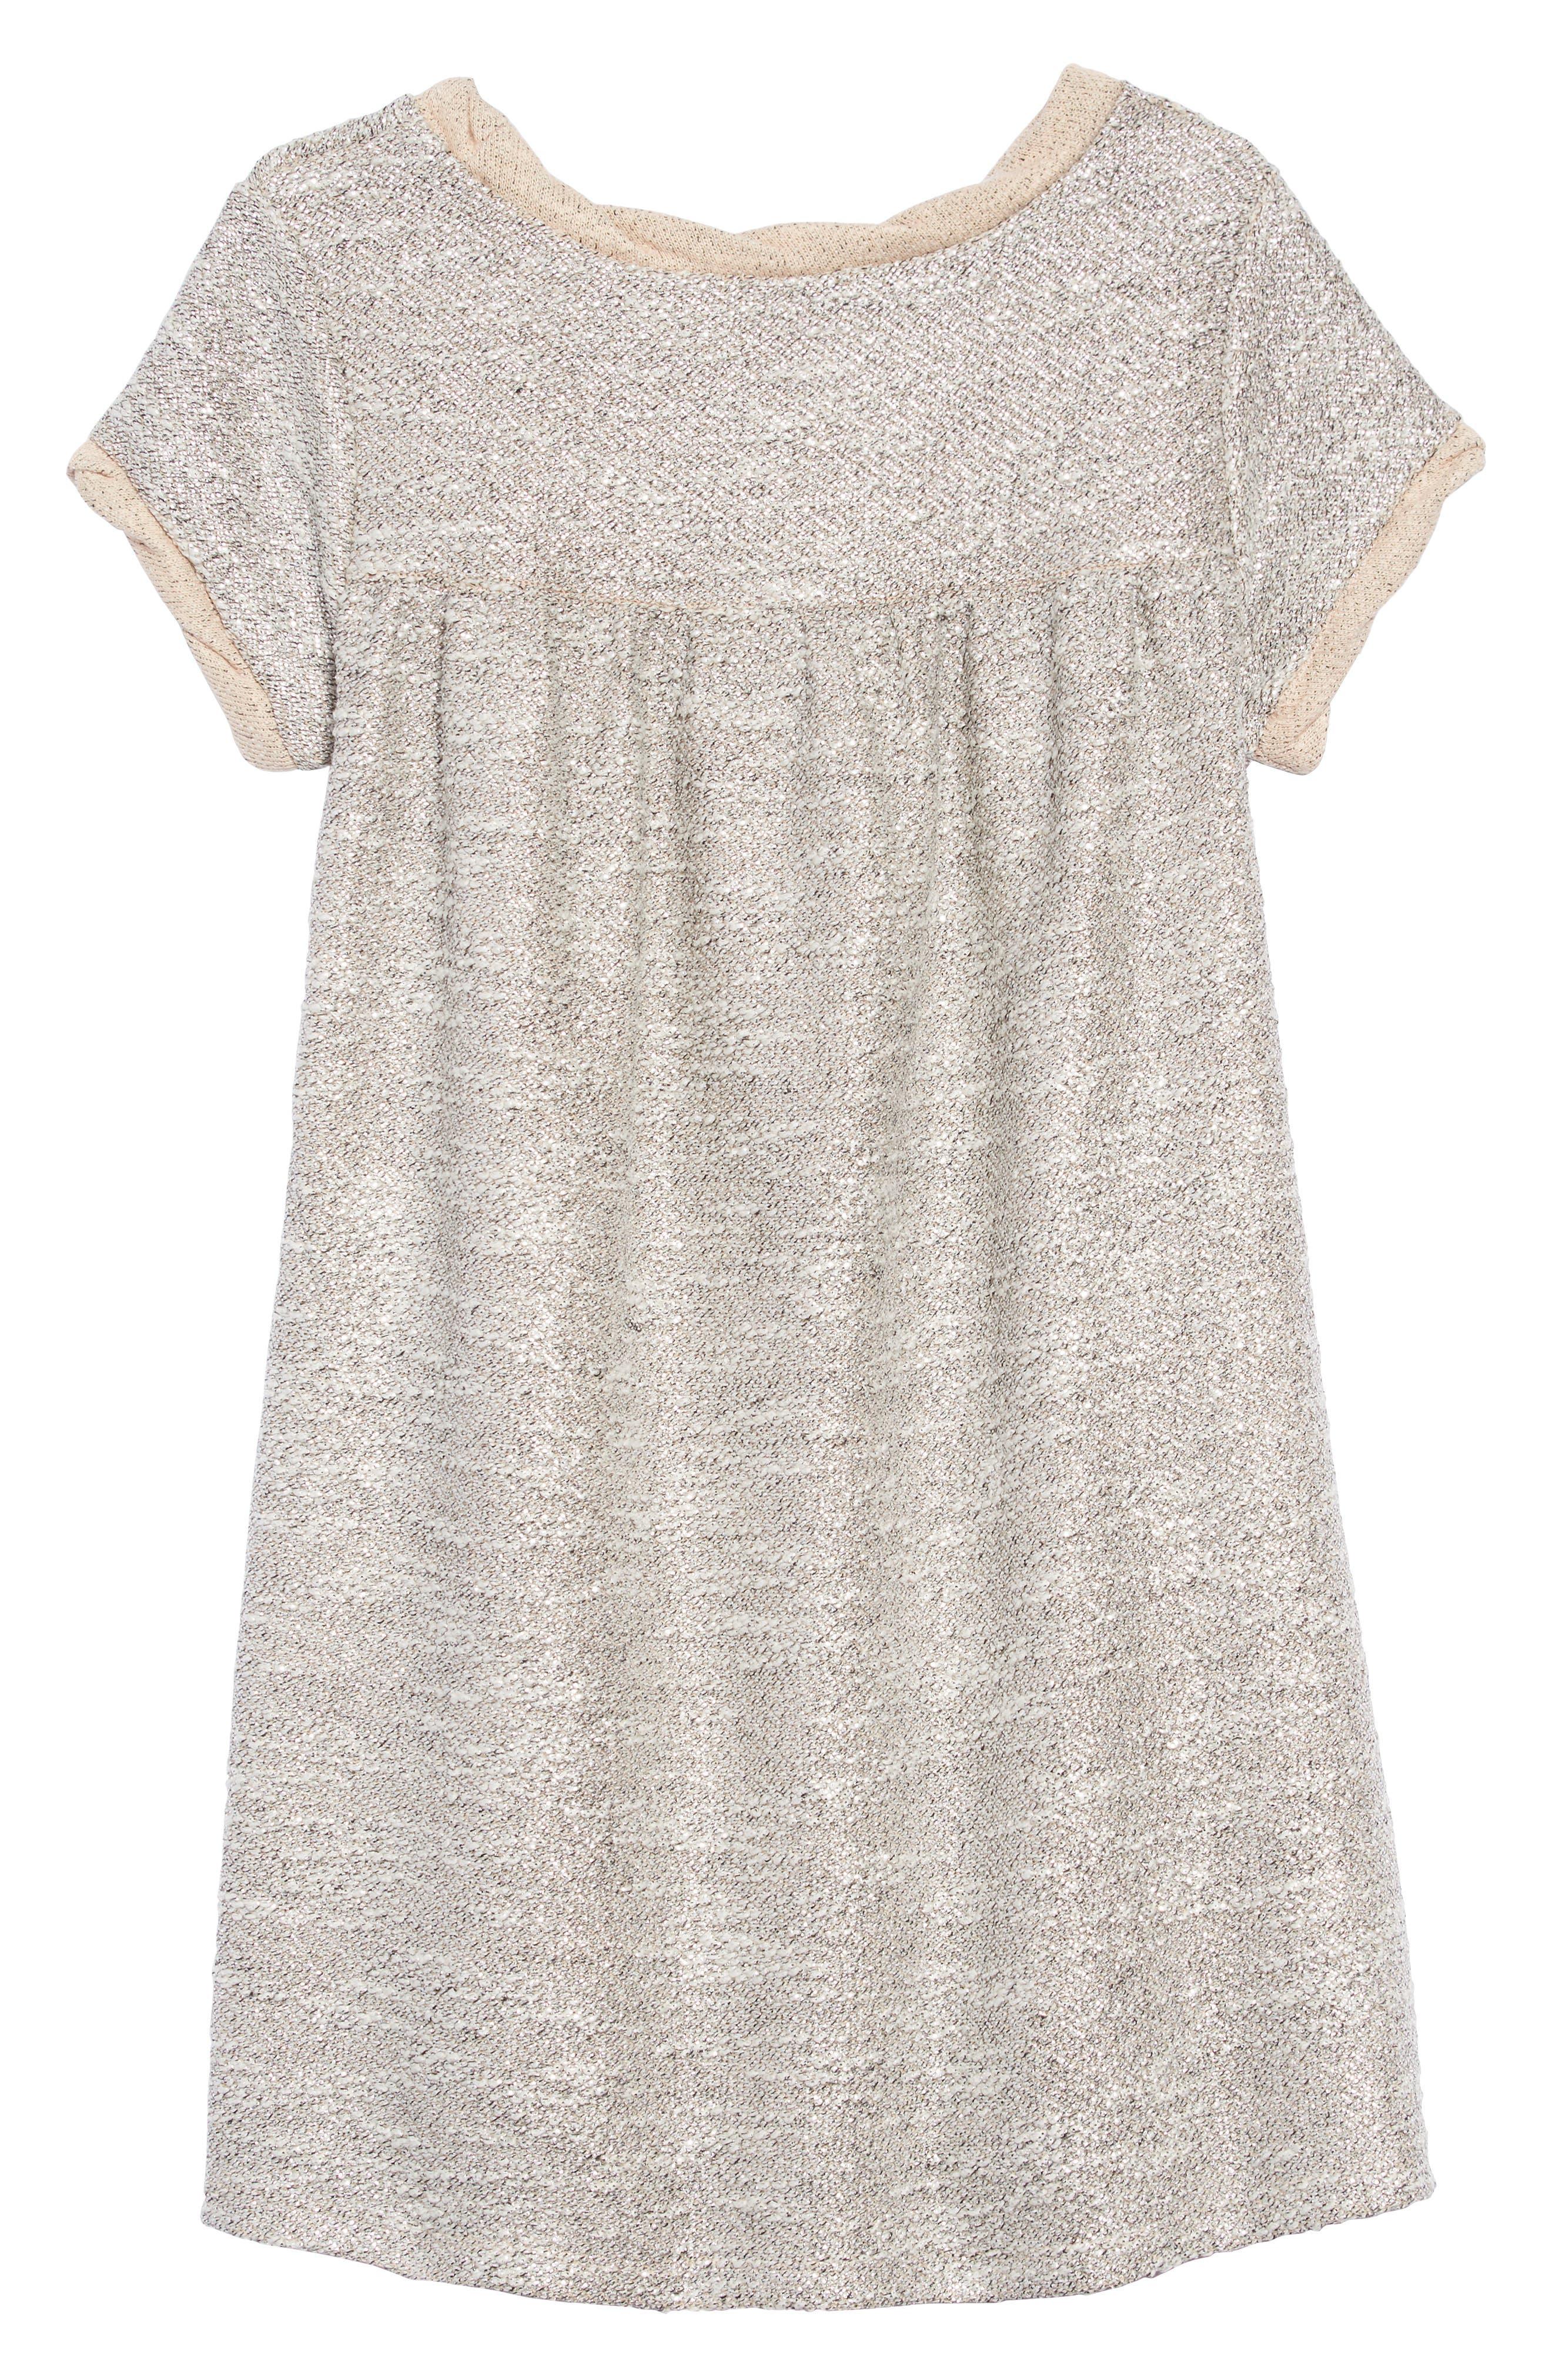 Metallic Shimmer Dress,                             Alternate thumbnail 2, color,                             PALE DOGWOOD